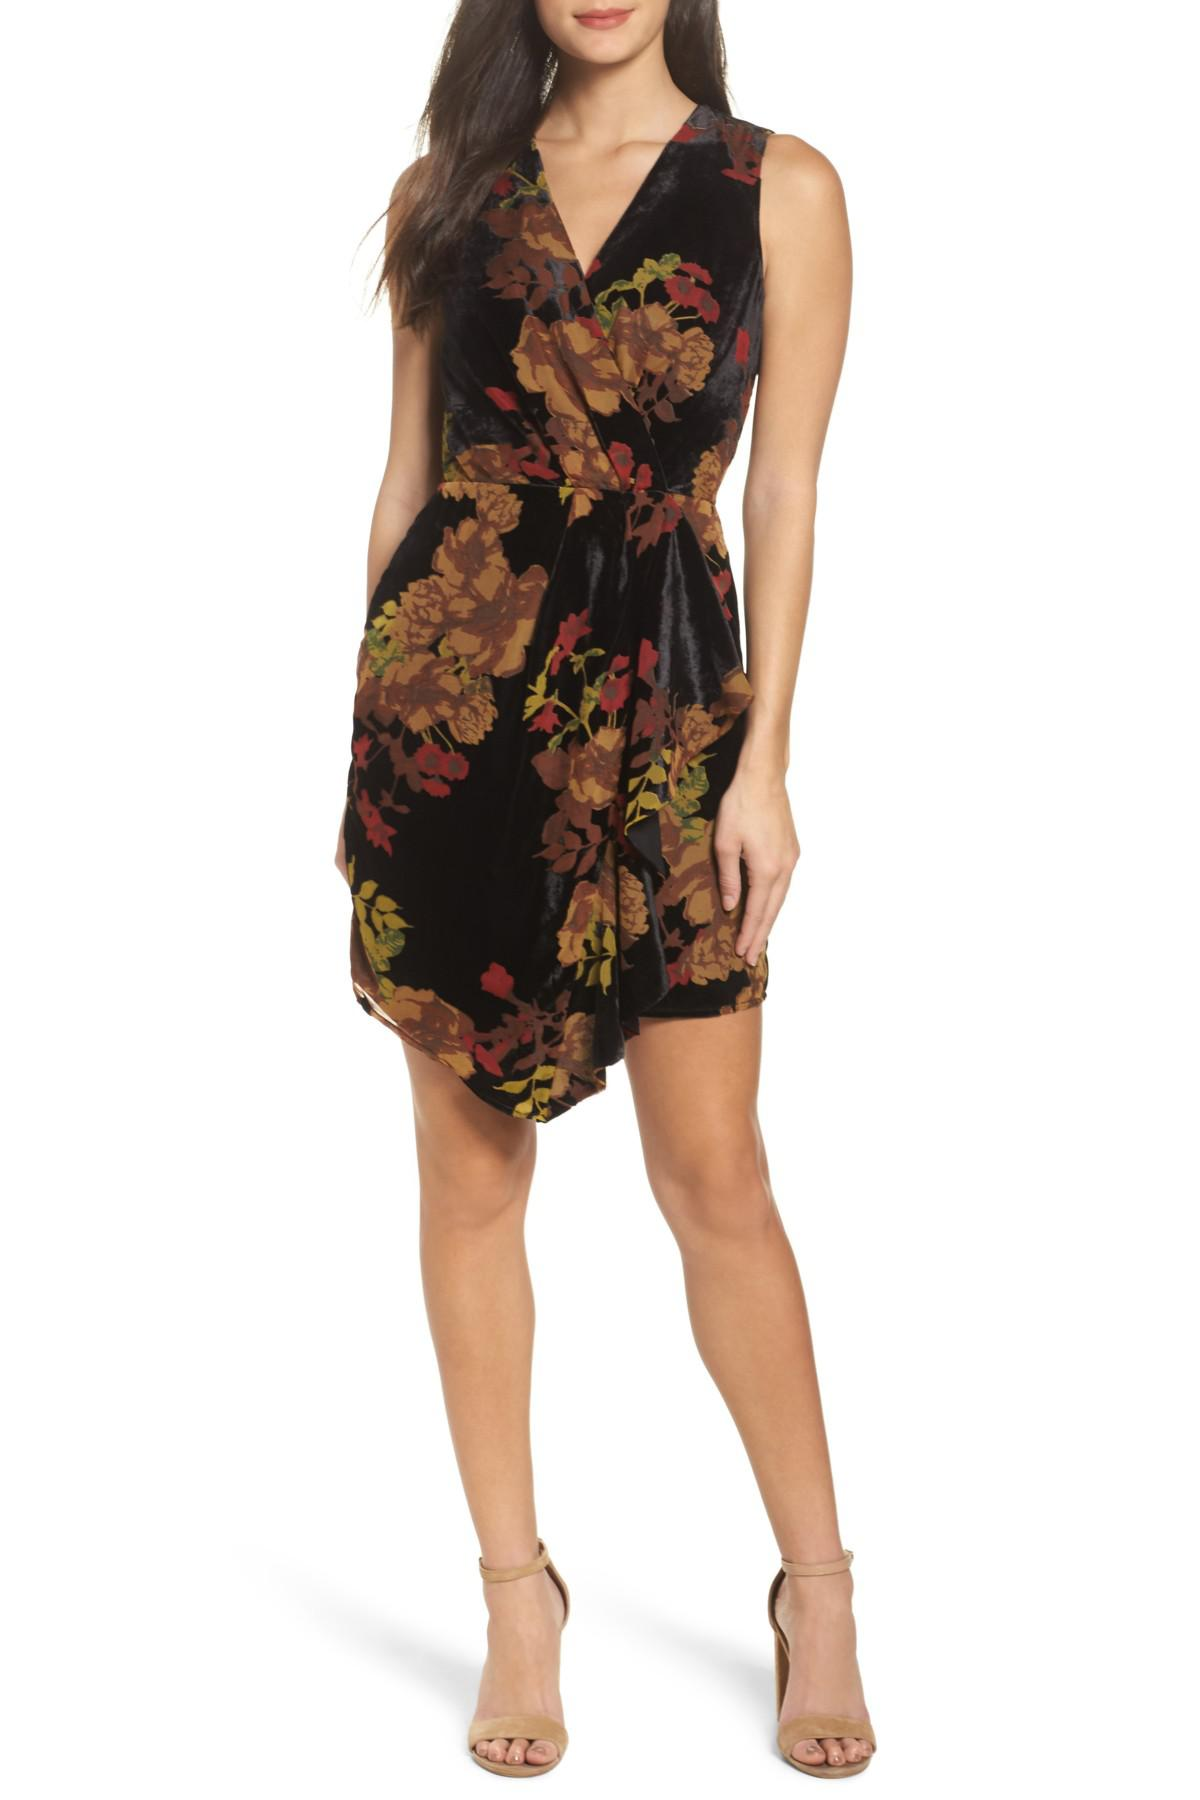 ab9d8446 Adelyn Rae Alyse Faux Wrap Velvet Dress in Black - Lyst